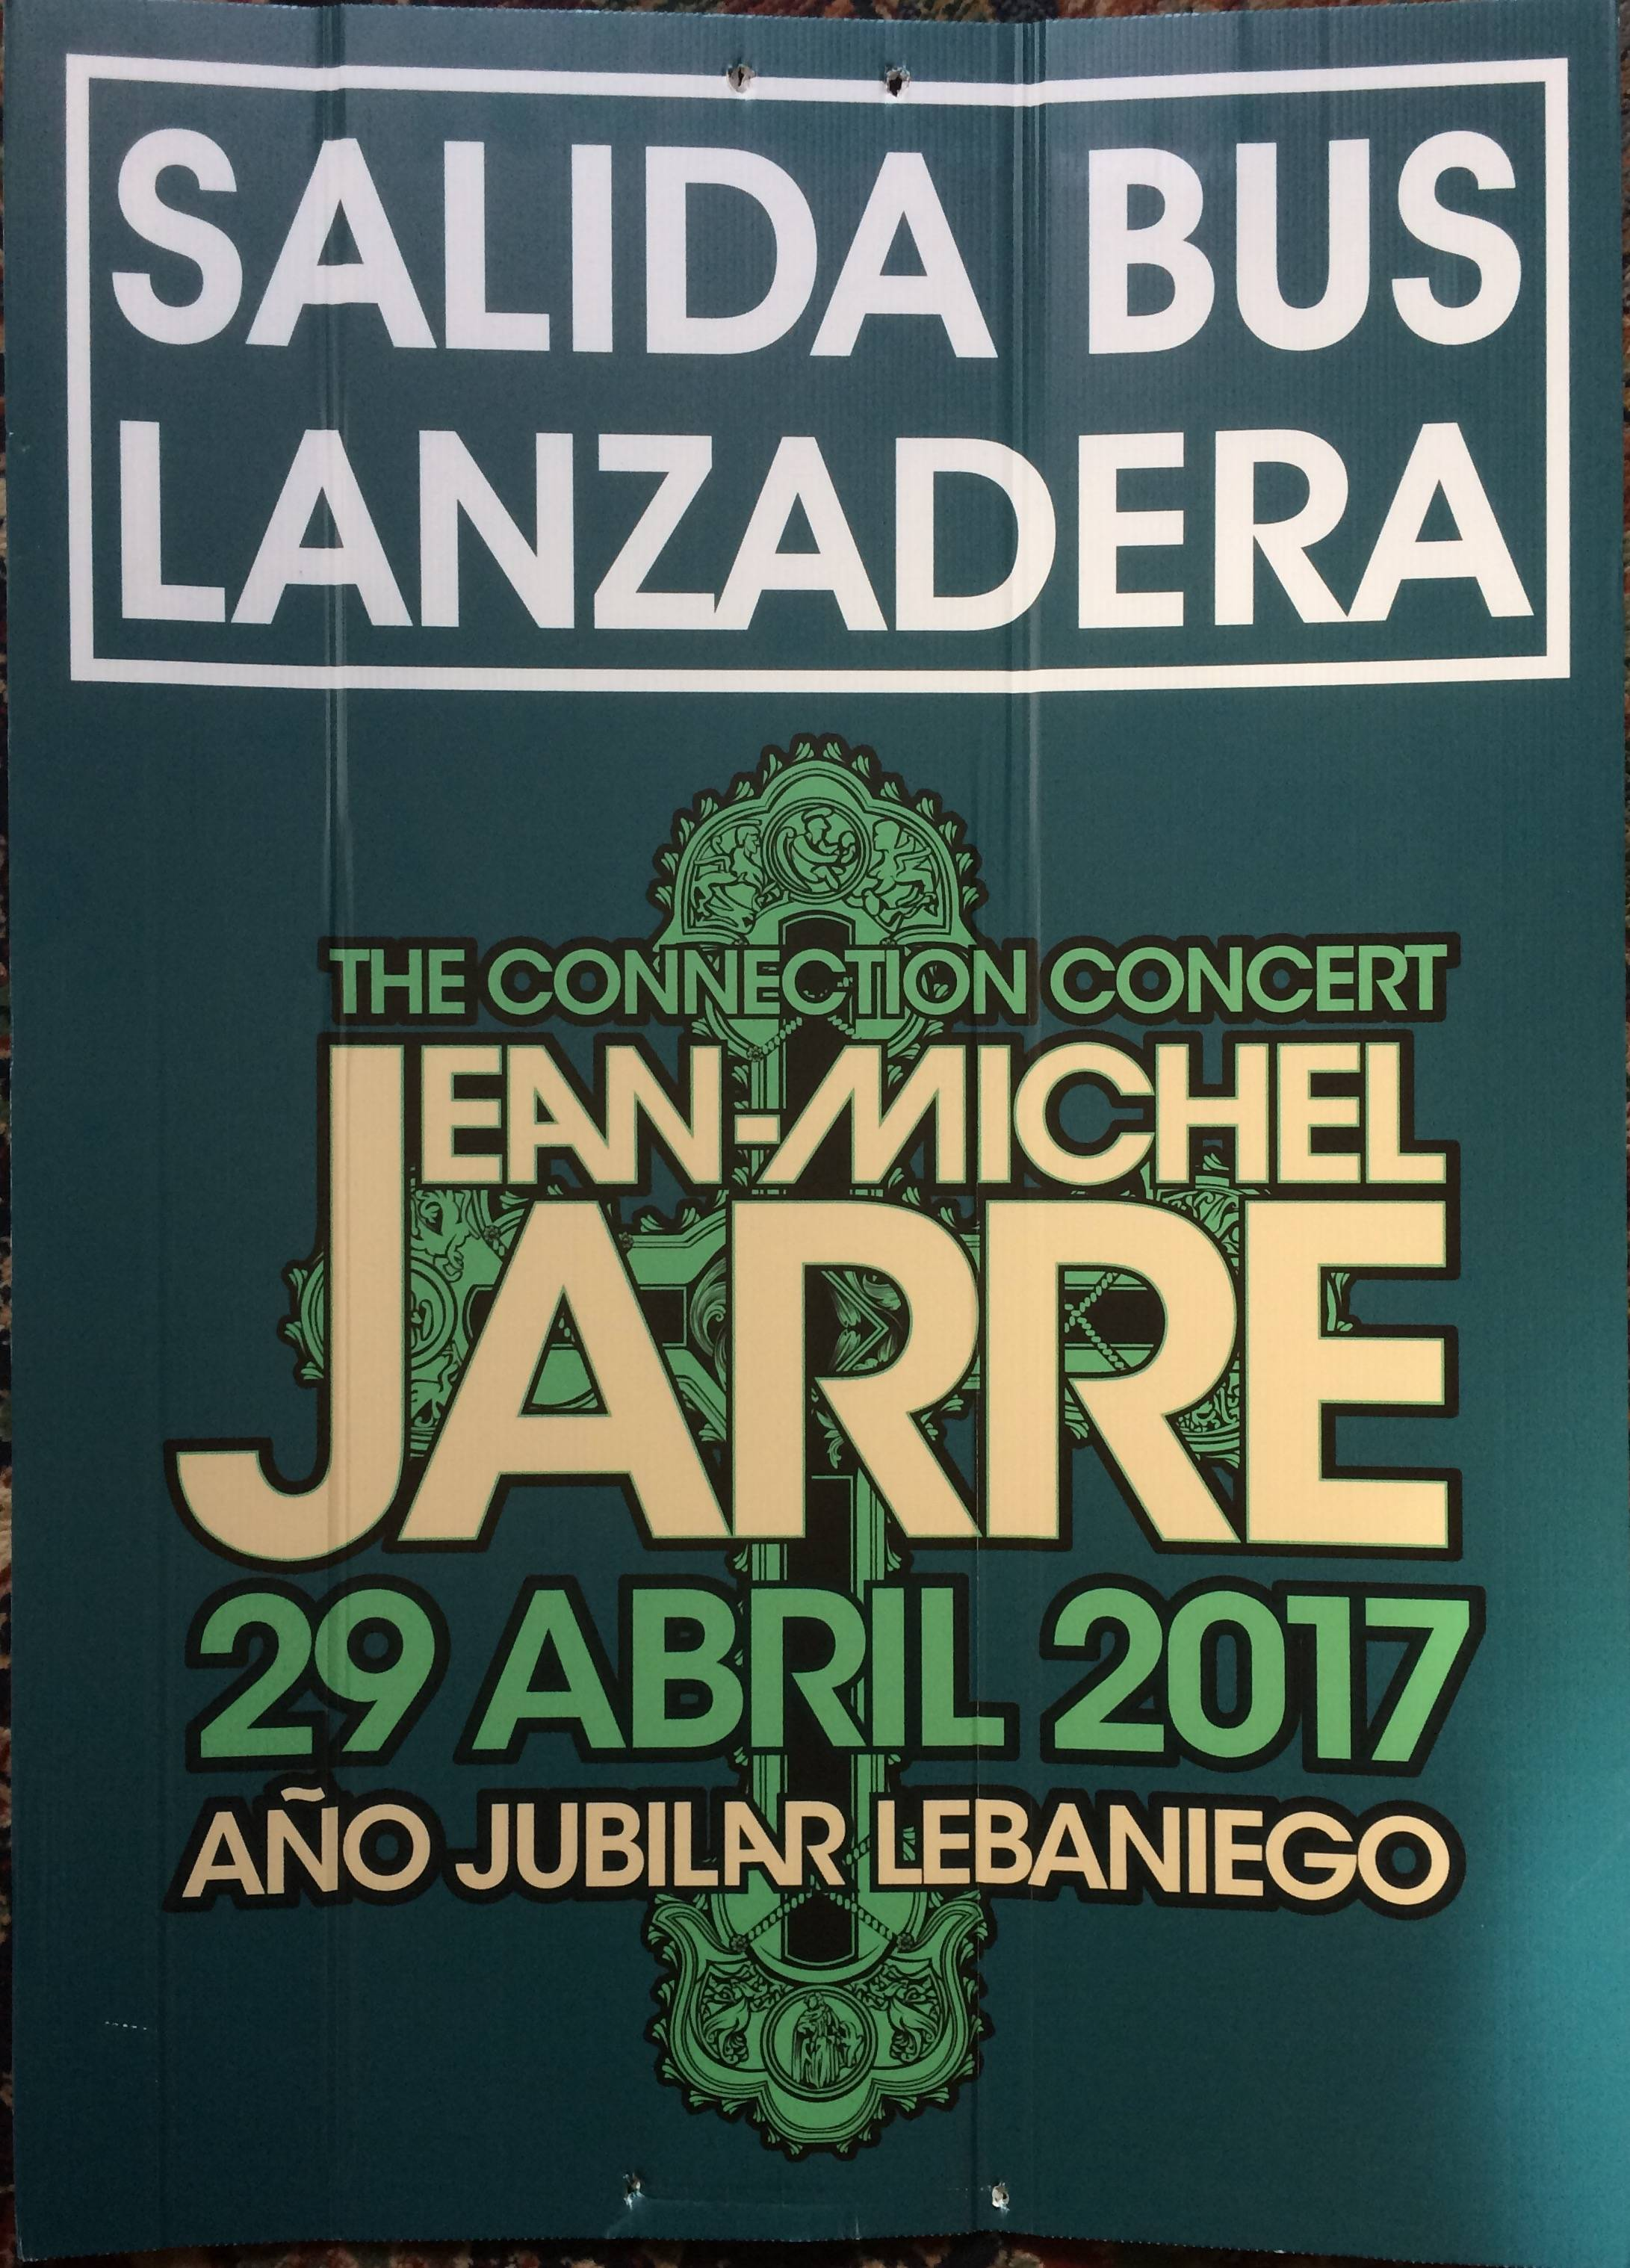 Connection Concert Bus Sign